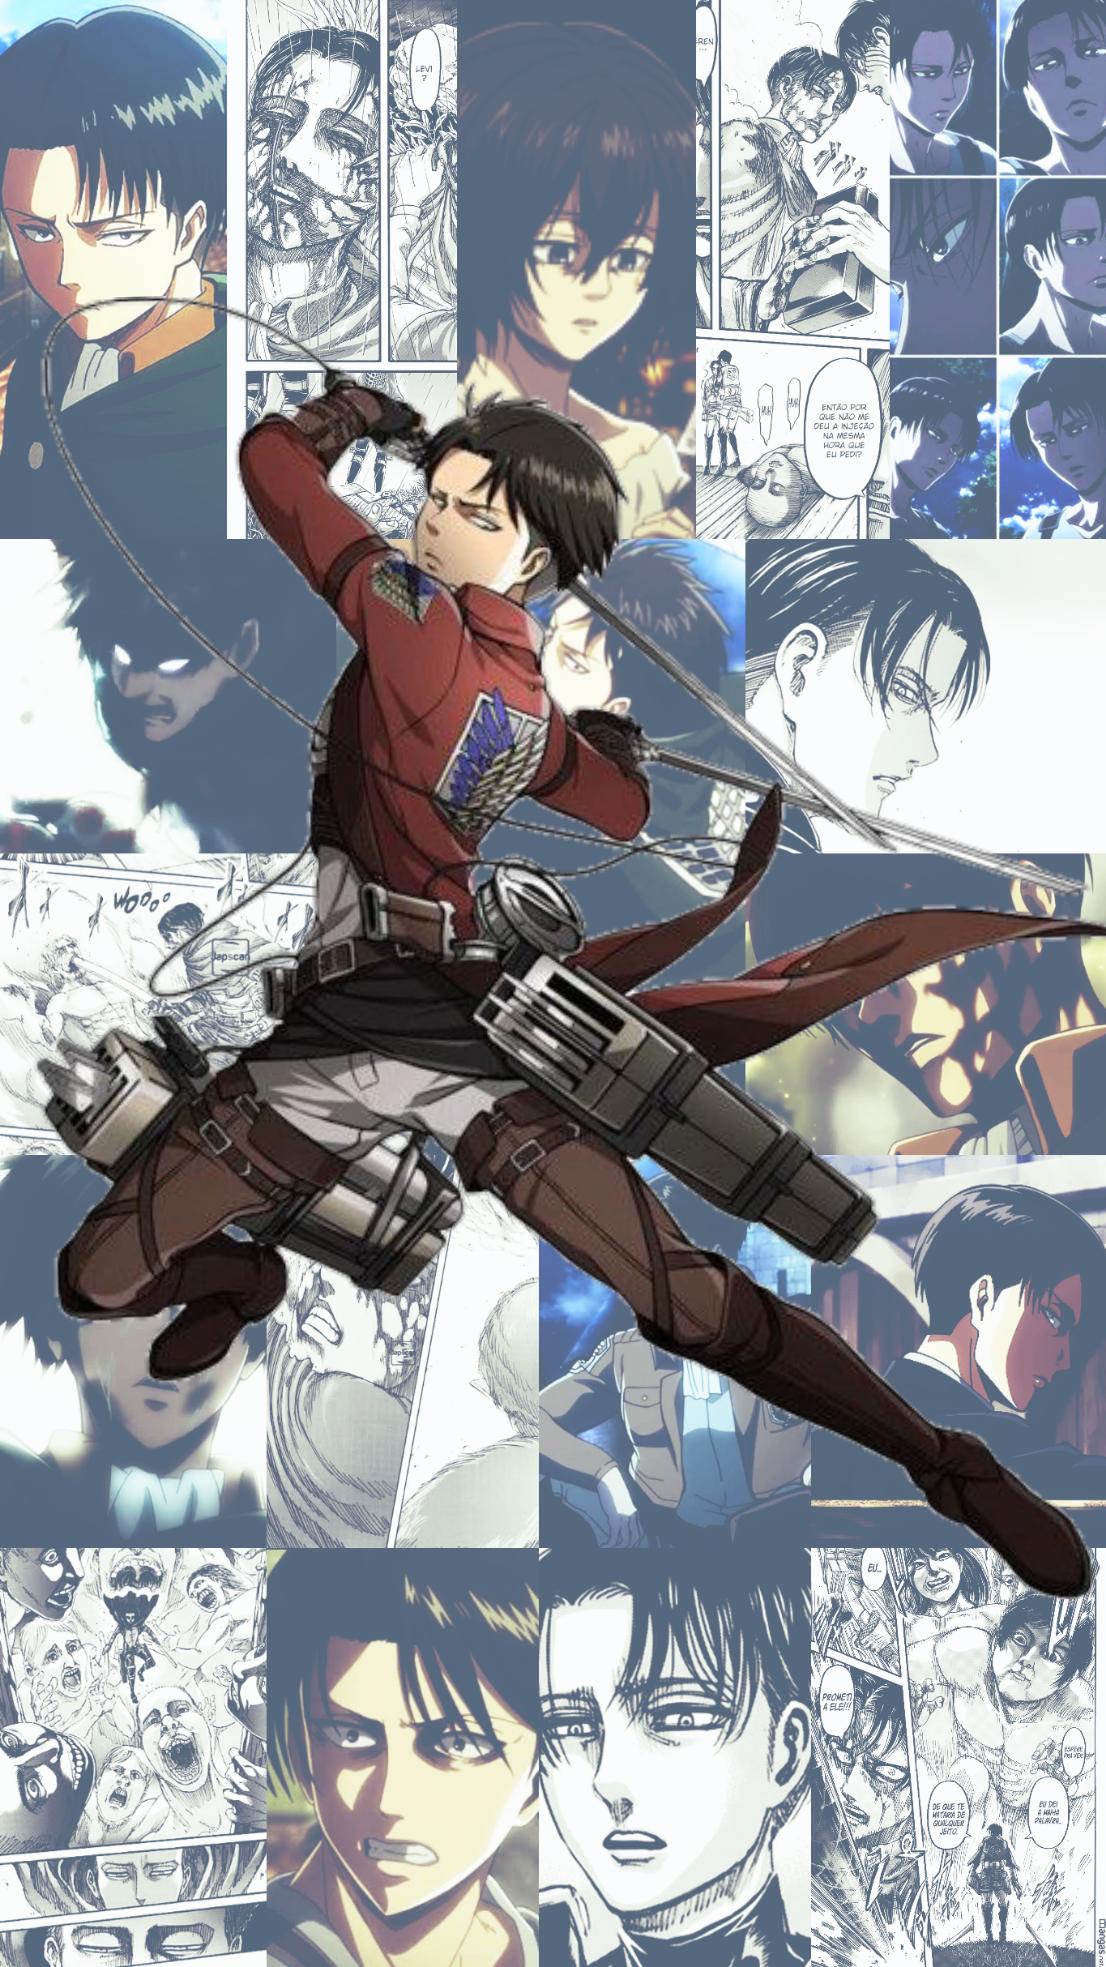 Levi Ackerman Cellphone Wallpaper Shingeki No Kyojin Personagens